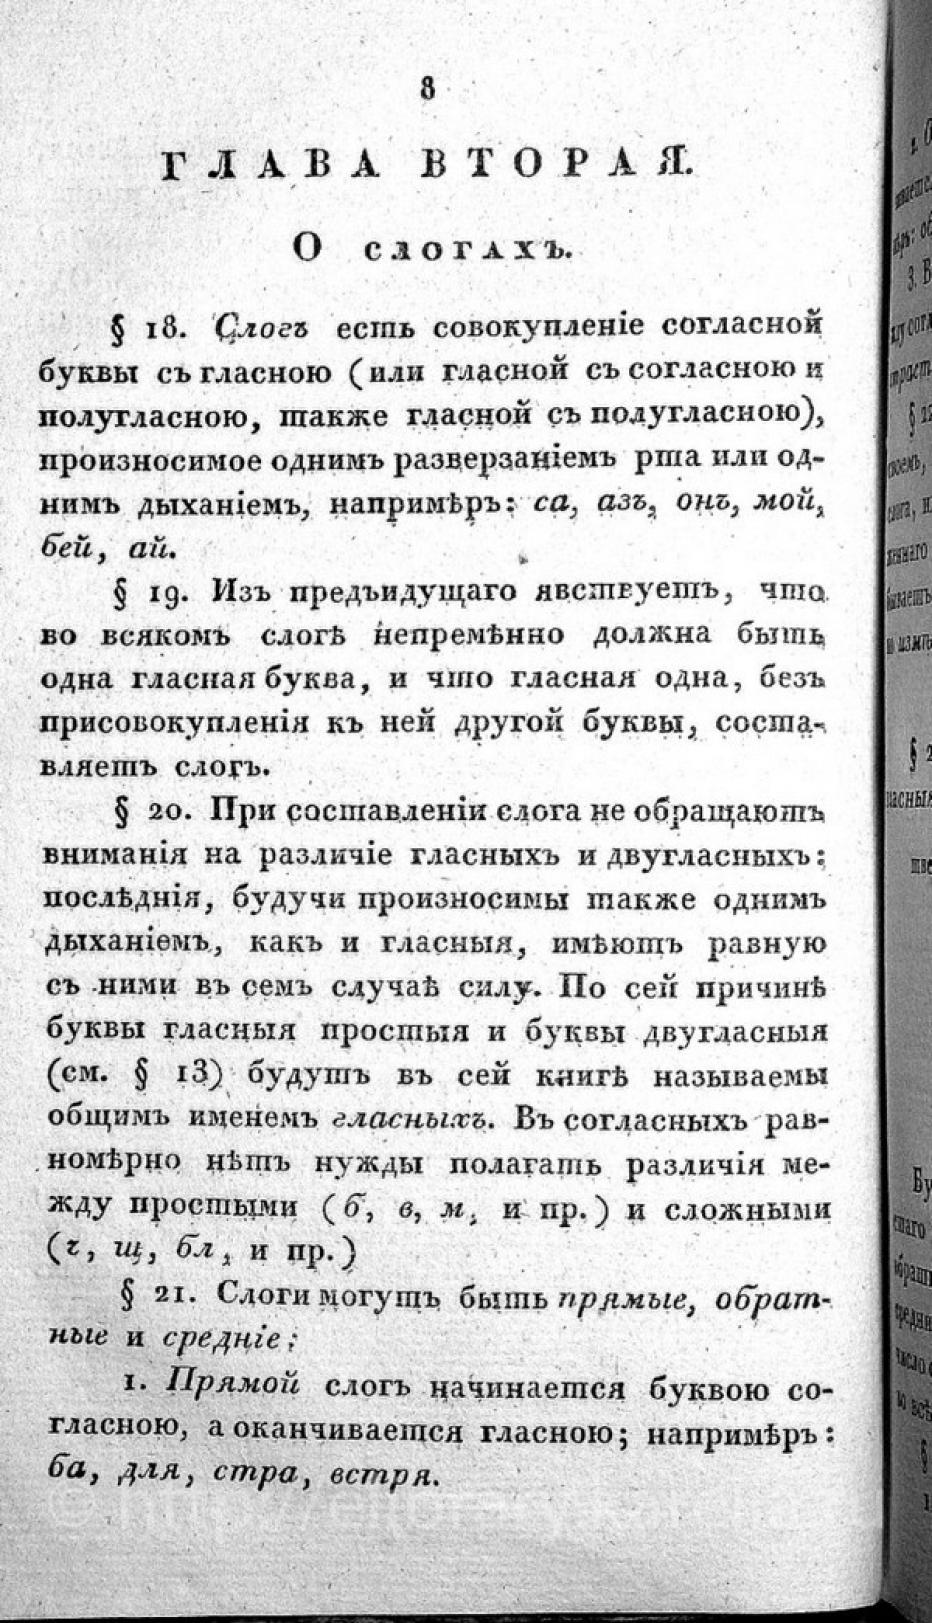 http://images.vfl.ru/ii/1406799435/3ec0f058/5856455.jpg